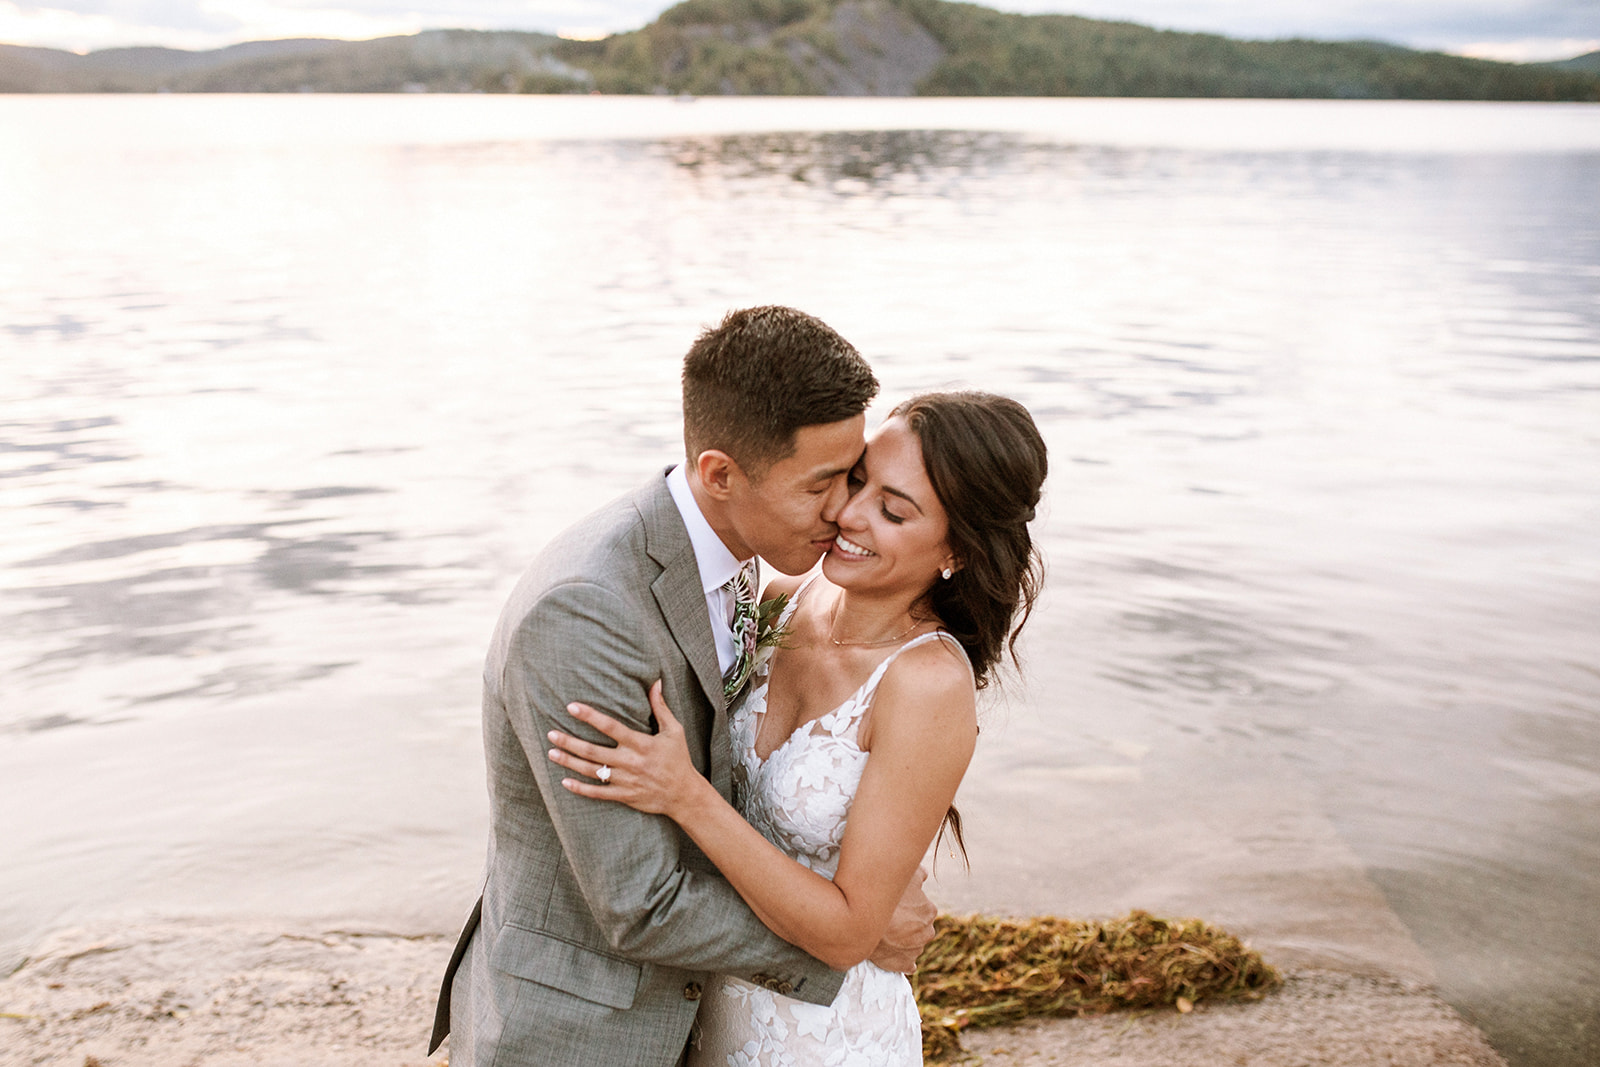 jose melgarejo brooklyn wedding photographer reviews sharonkai